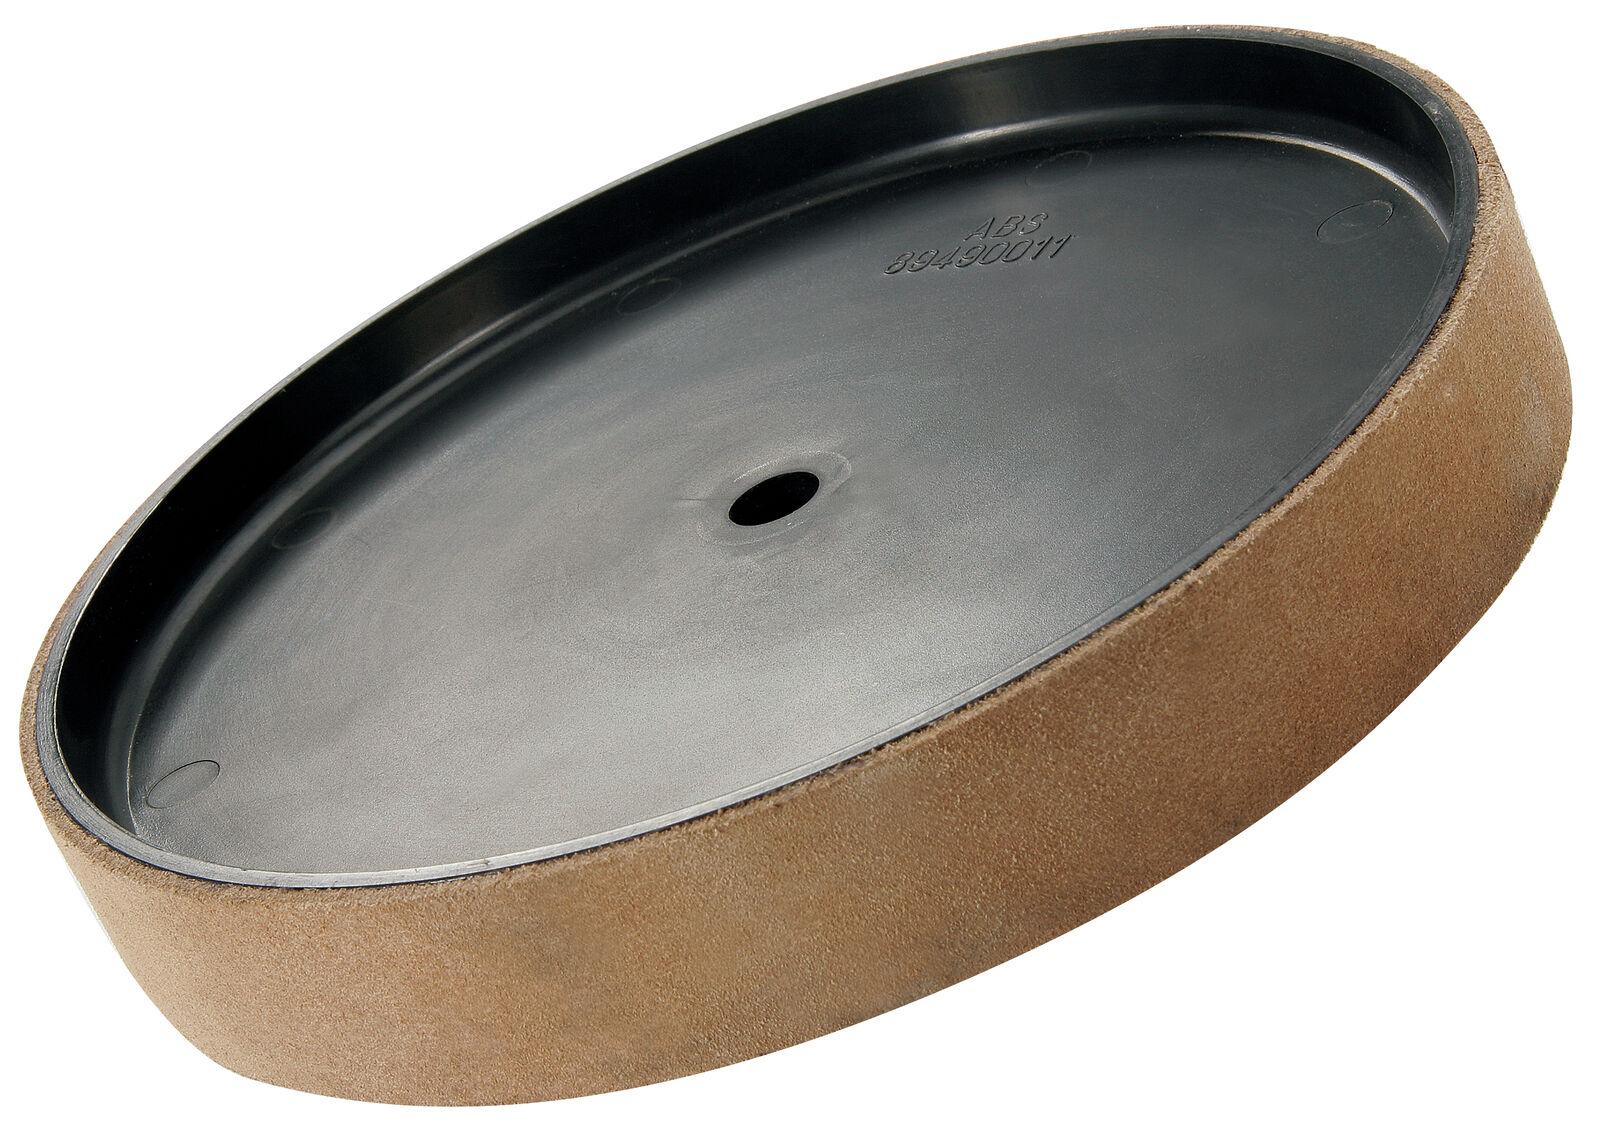 HOLZKRAFT Nassschleifmaschine NTS 255 Nassschleifer Nassschleifsystem Metall